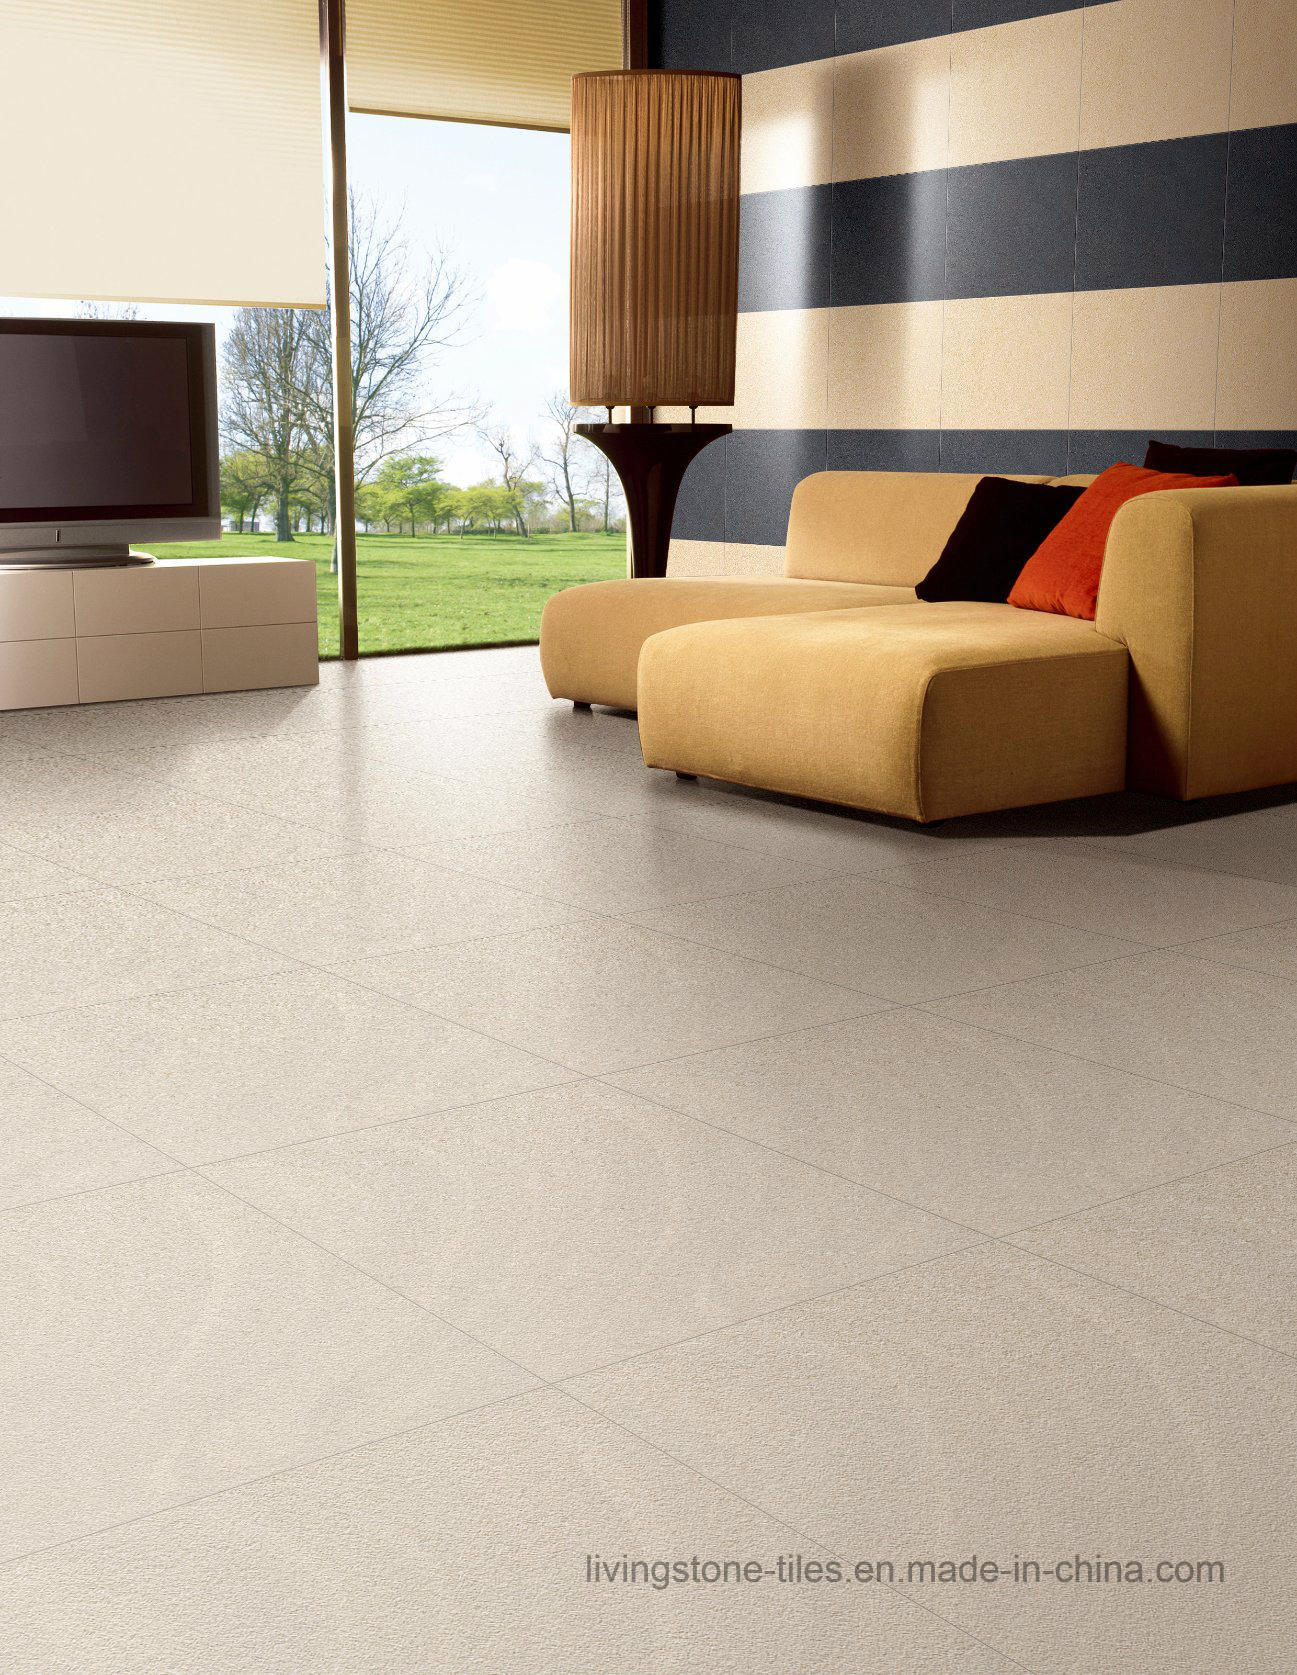 floor pexels your choosing for tiles floors natural blog porcelain home direct versus photo stone